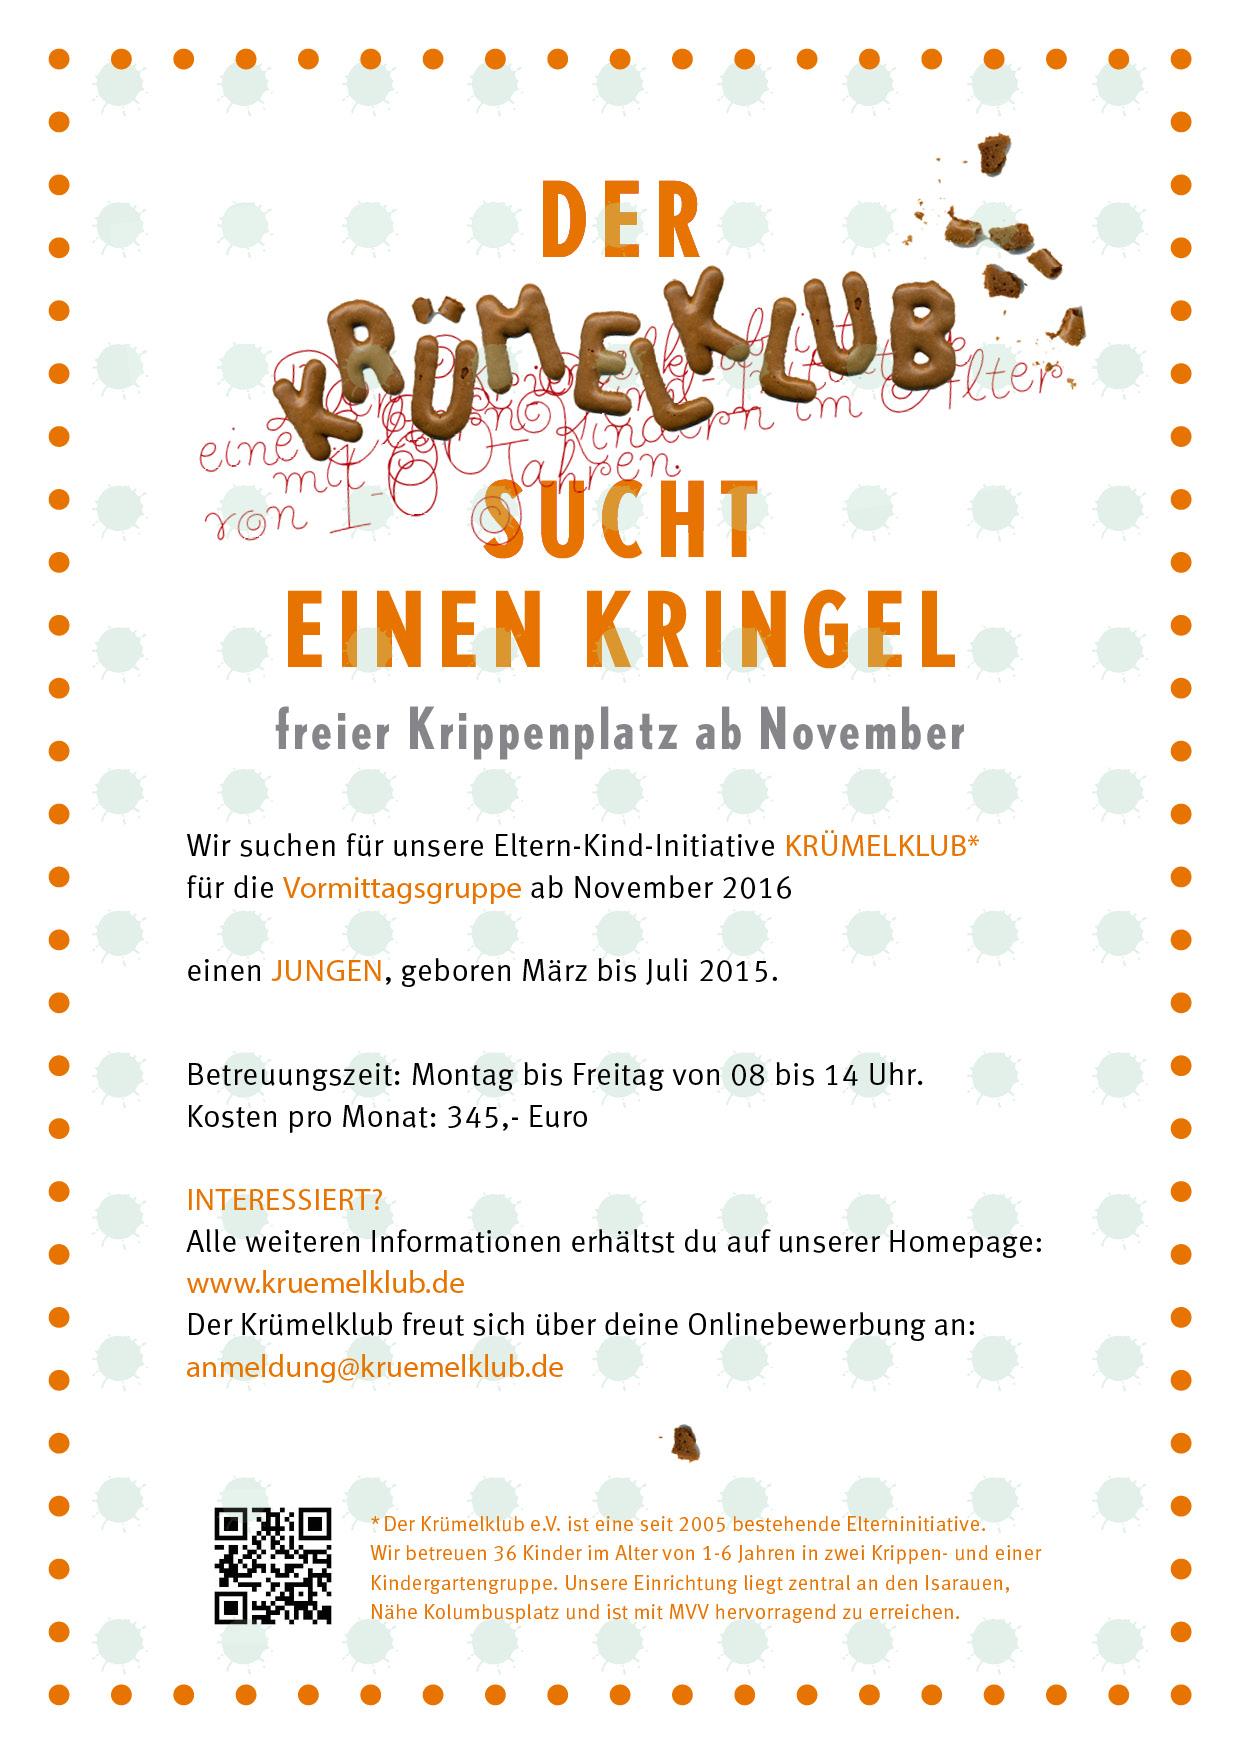 Krümelklub sucht Kringel